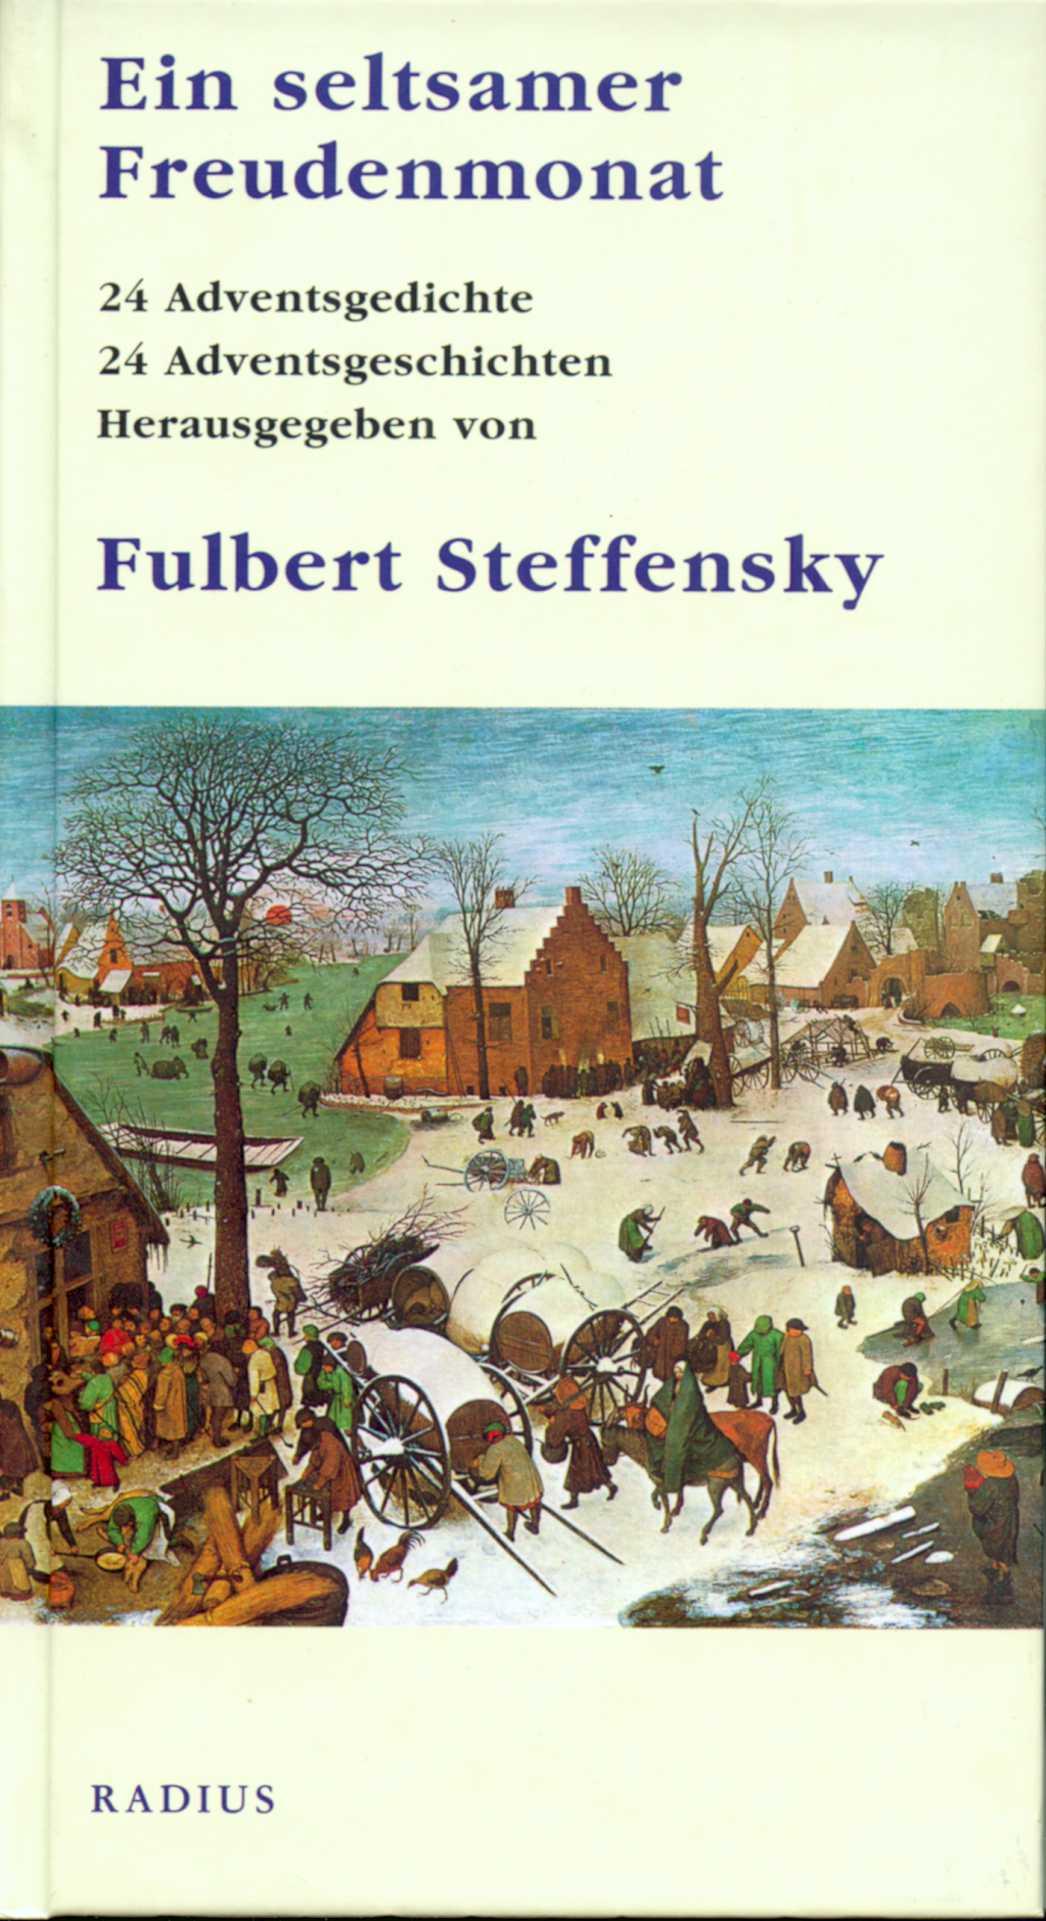 Ein seltsamer Freudenmonat - Fulbert Steffensky -  9783871739248